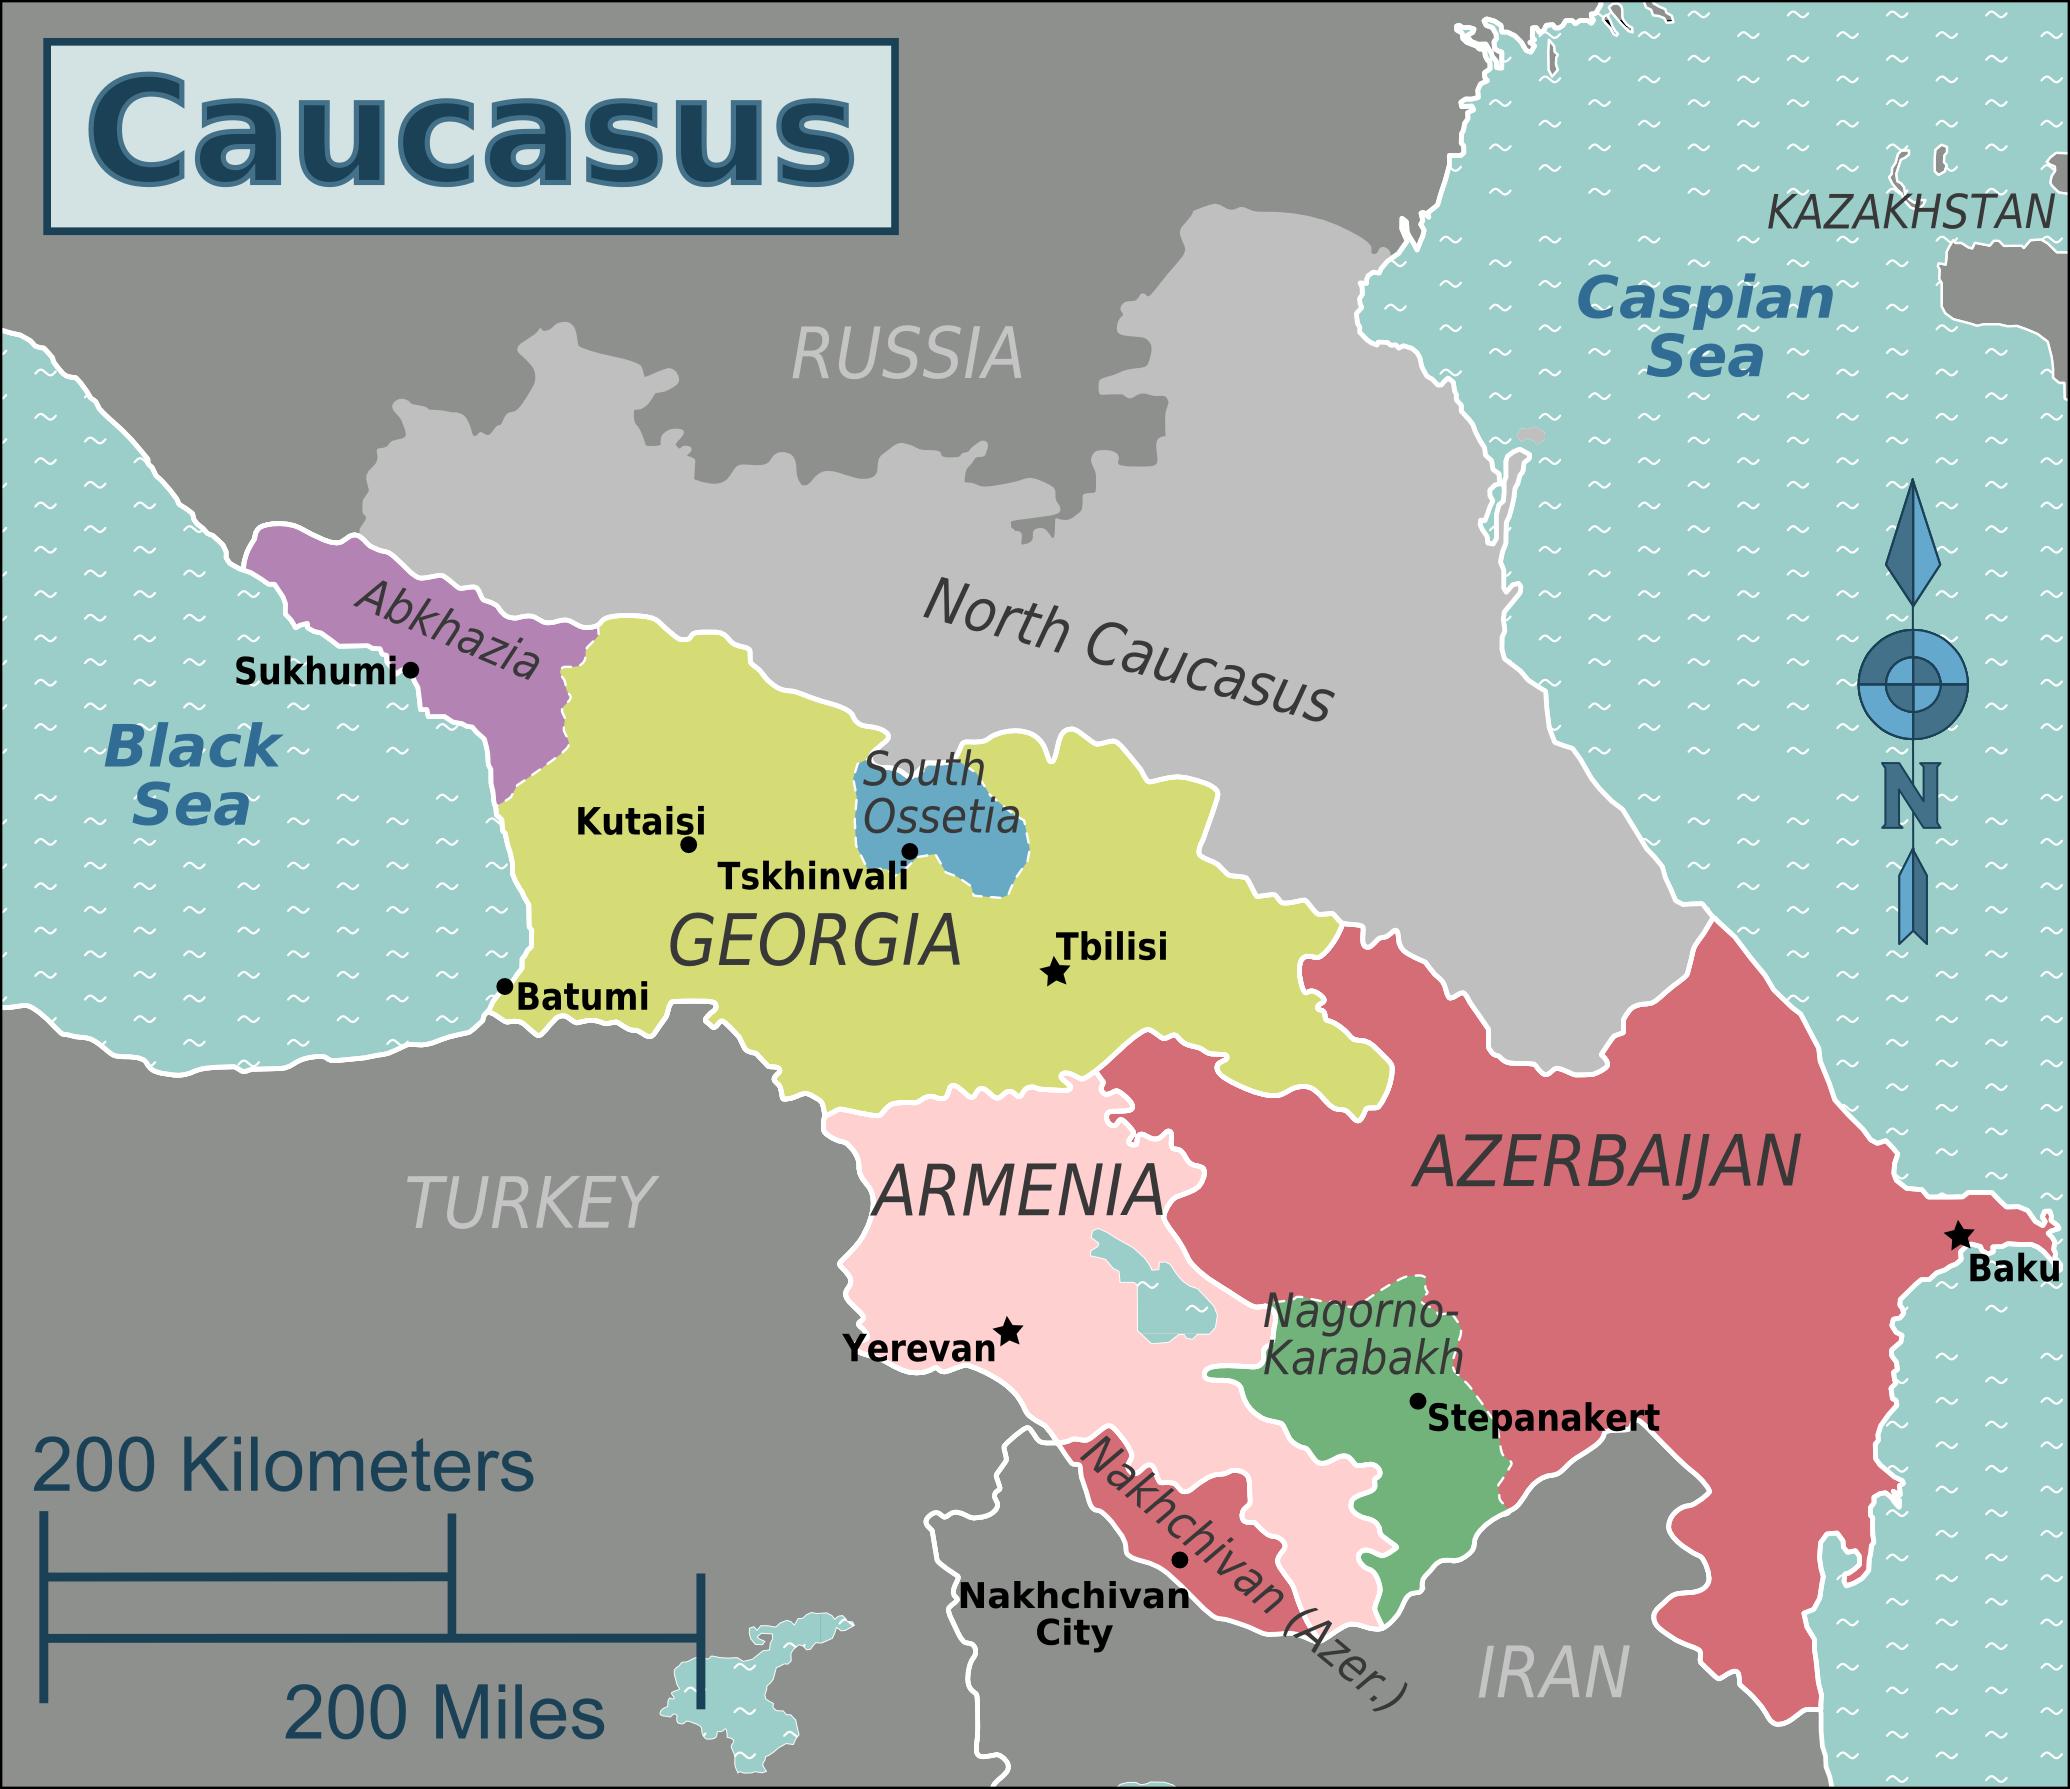 EODE TT - VU DES USA caucase confrontation (2015 08 20)  FR (2)